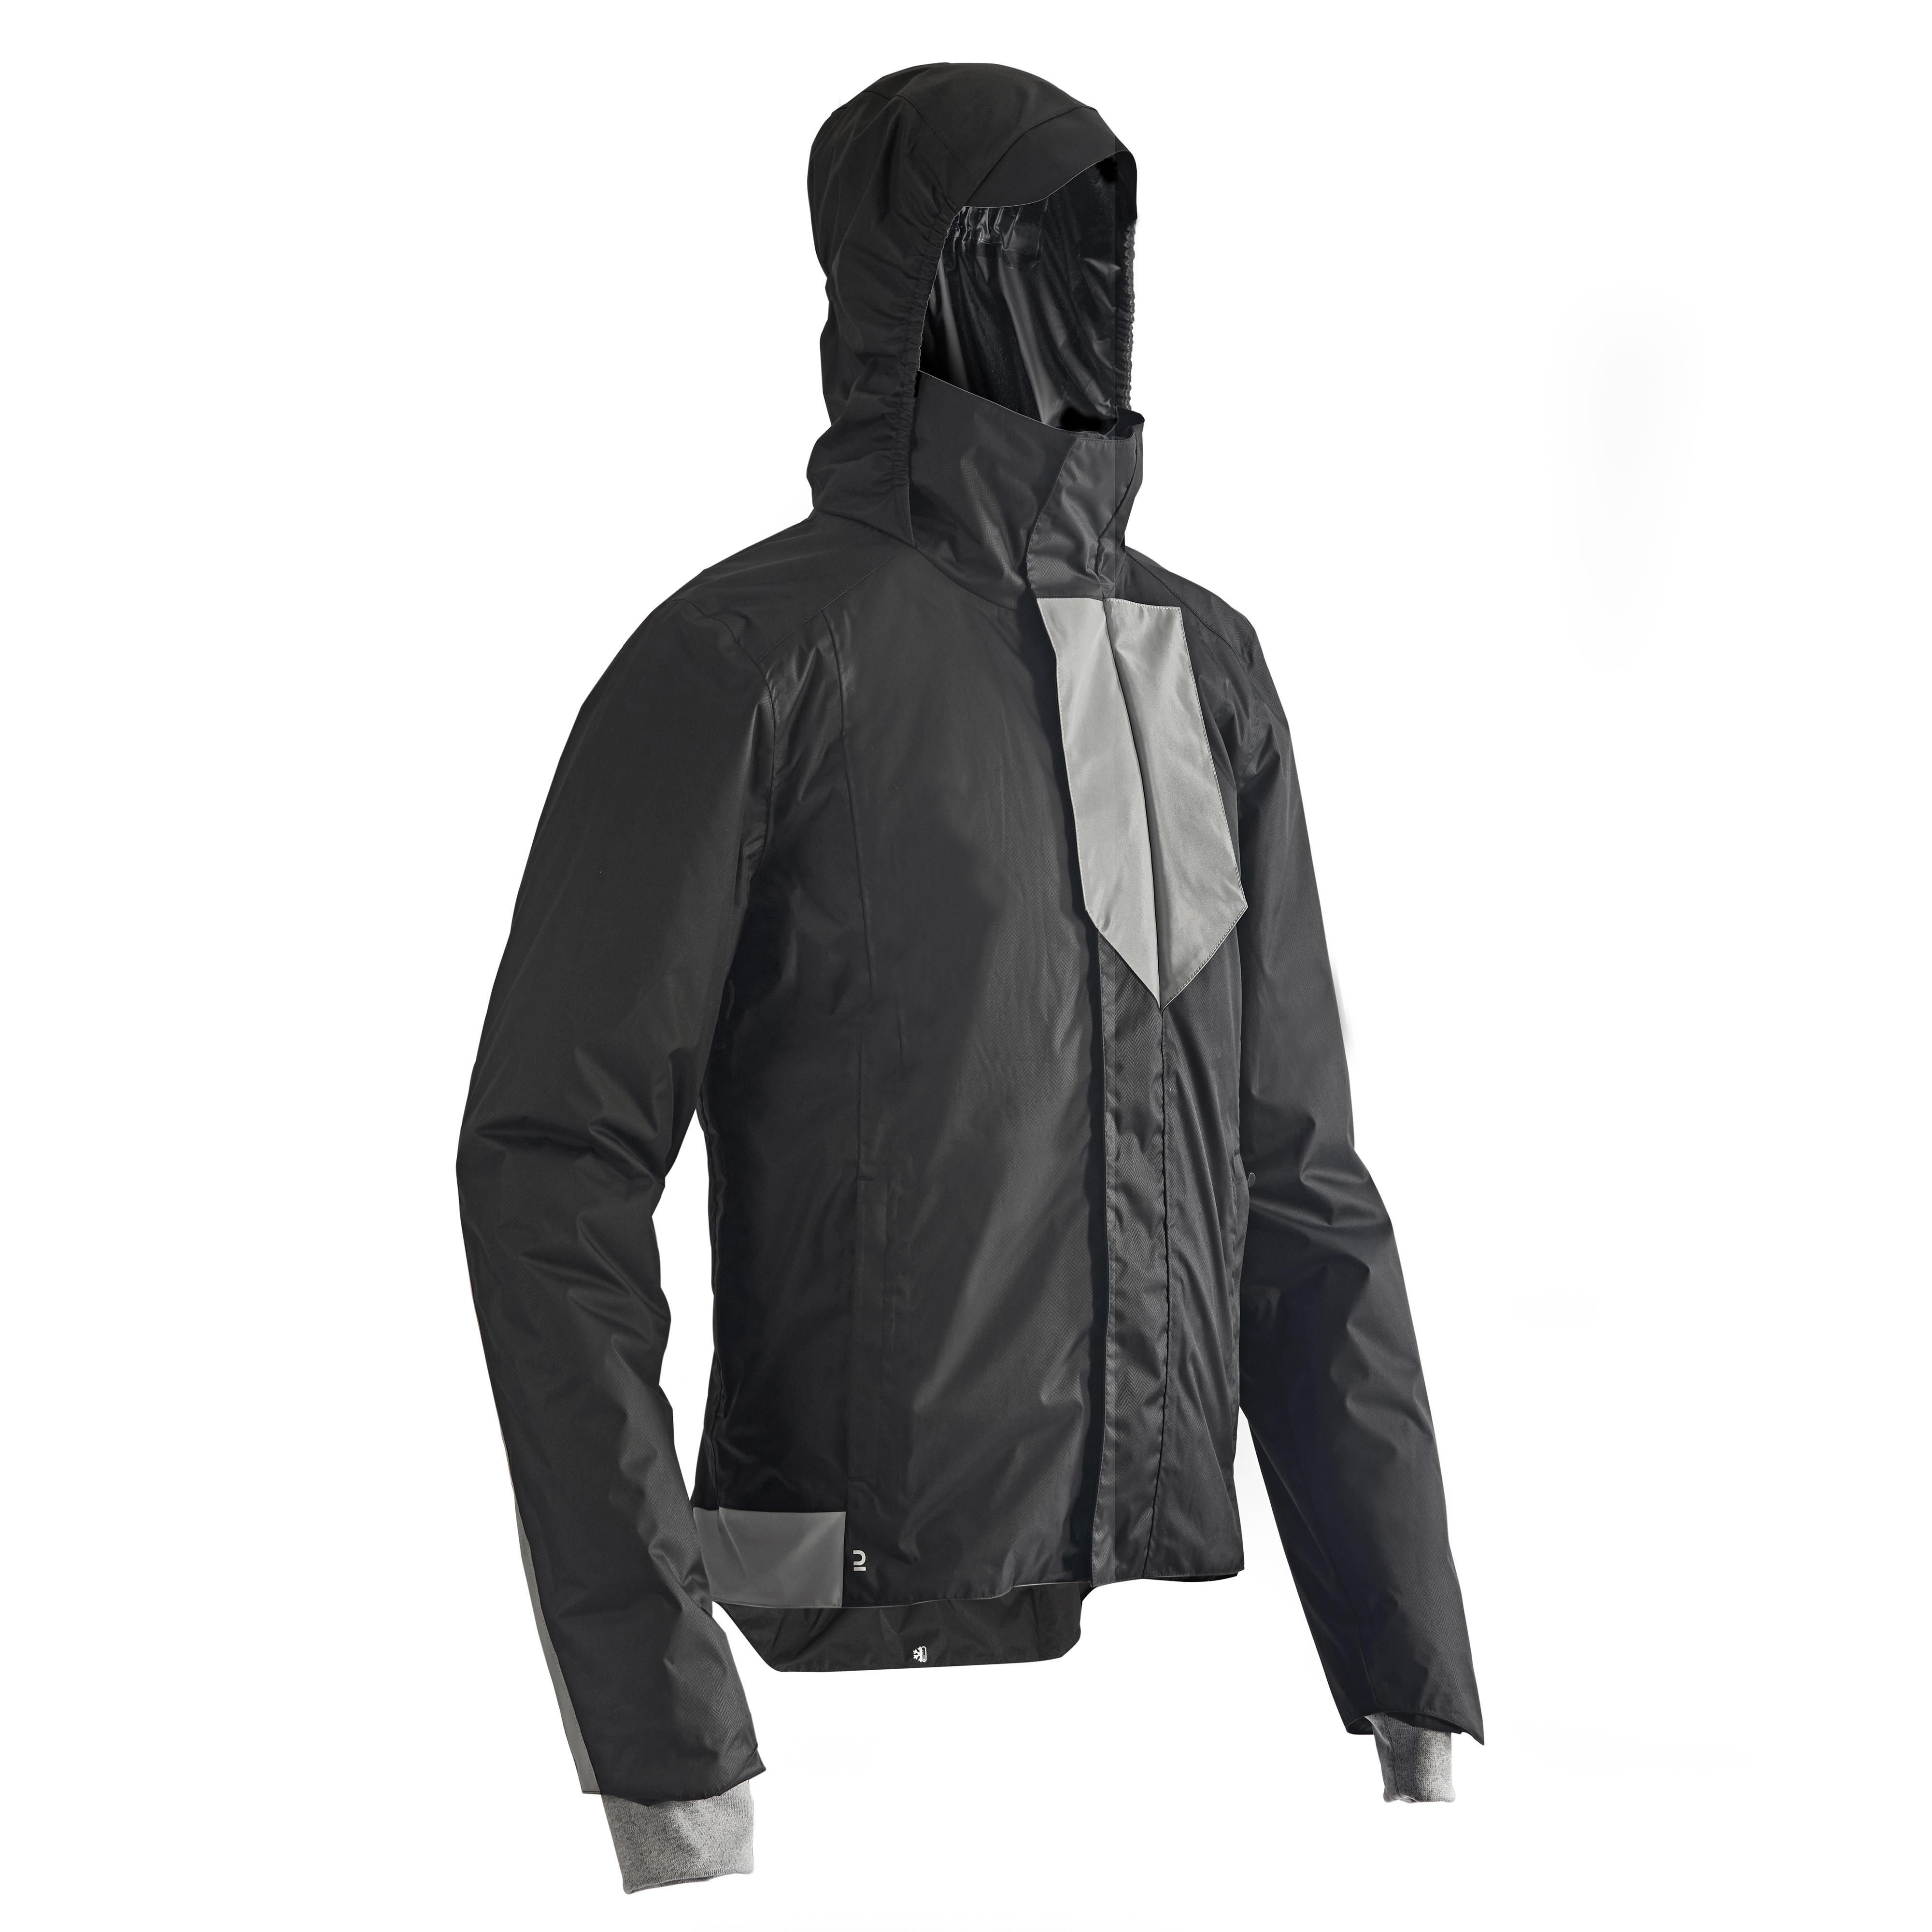 Jachetă ciclism ploaie 500 imagine